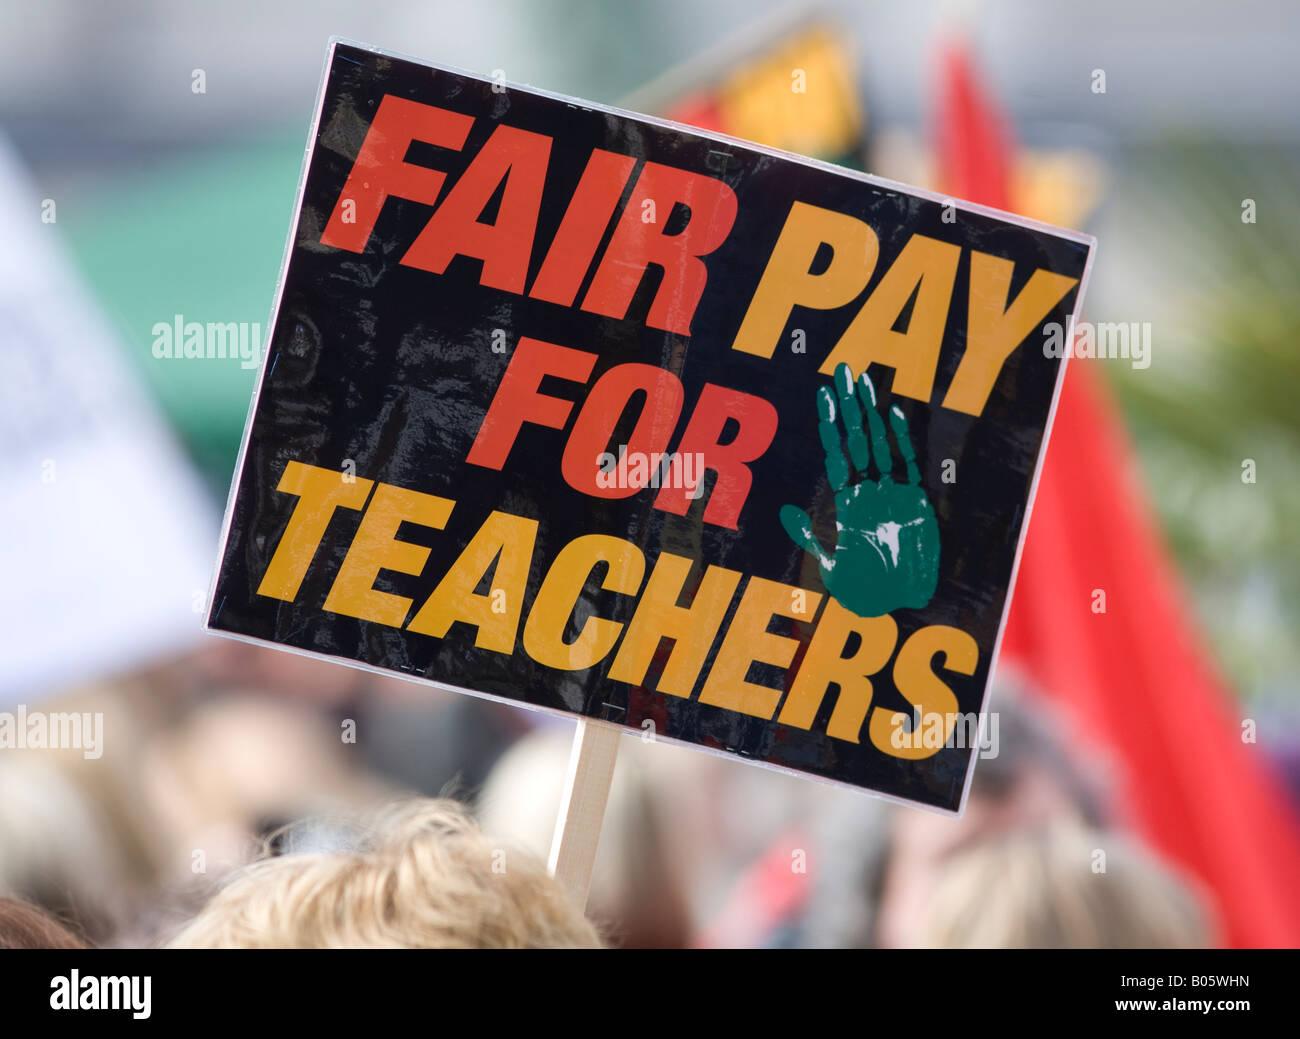 National Union of Teachers strike Birmingham England UK - Stock Image